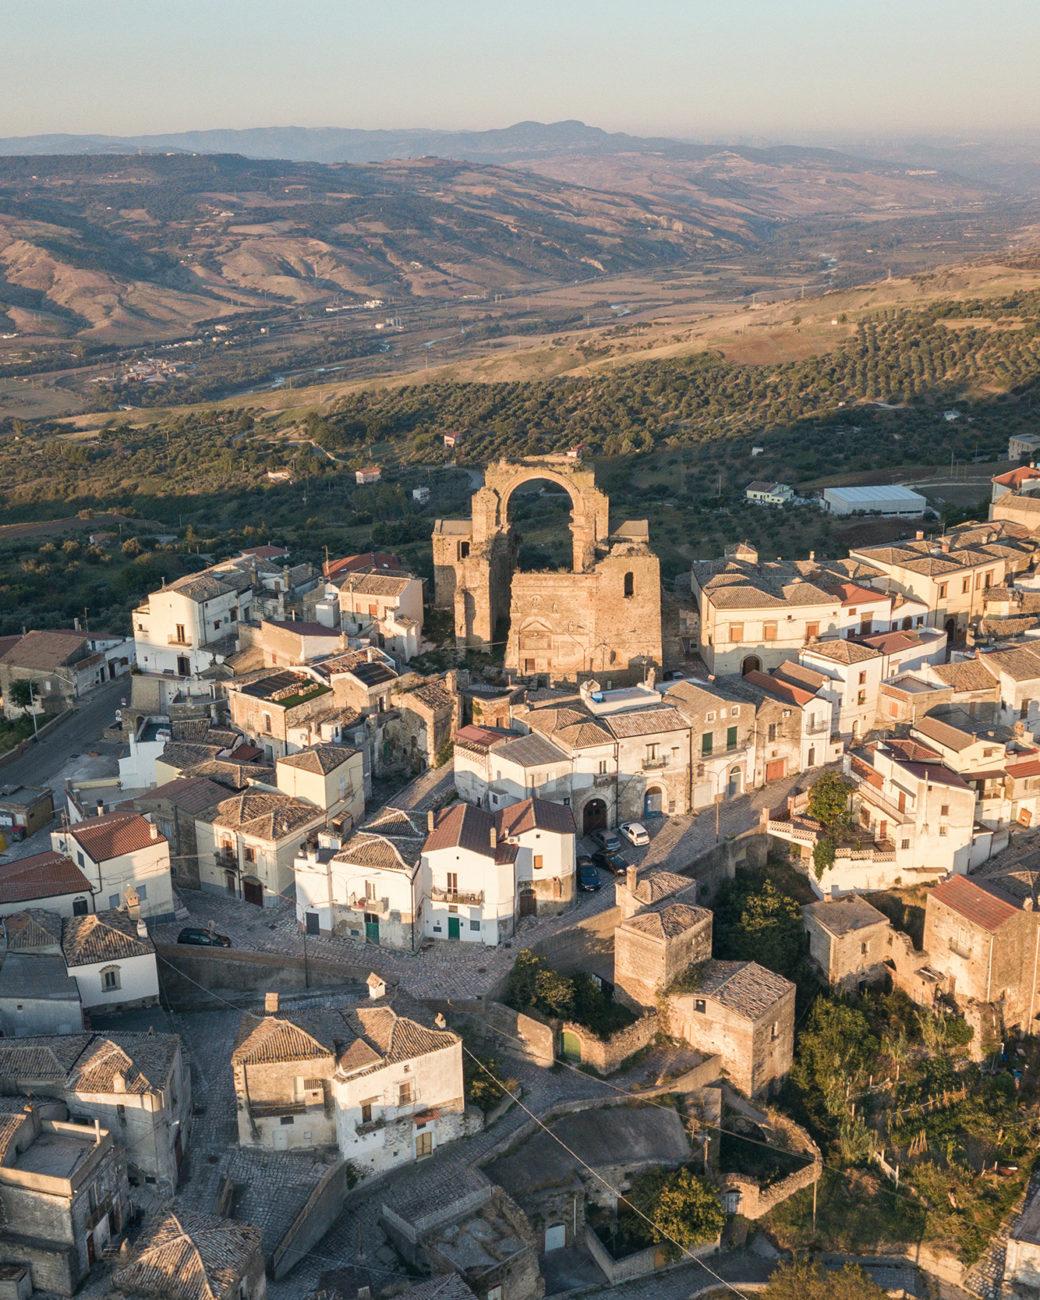 Zdarma do Itálie na 3 měsíce? Ano, Airbnb Vás zve, aby pomohl malebné vesničce